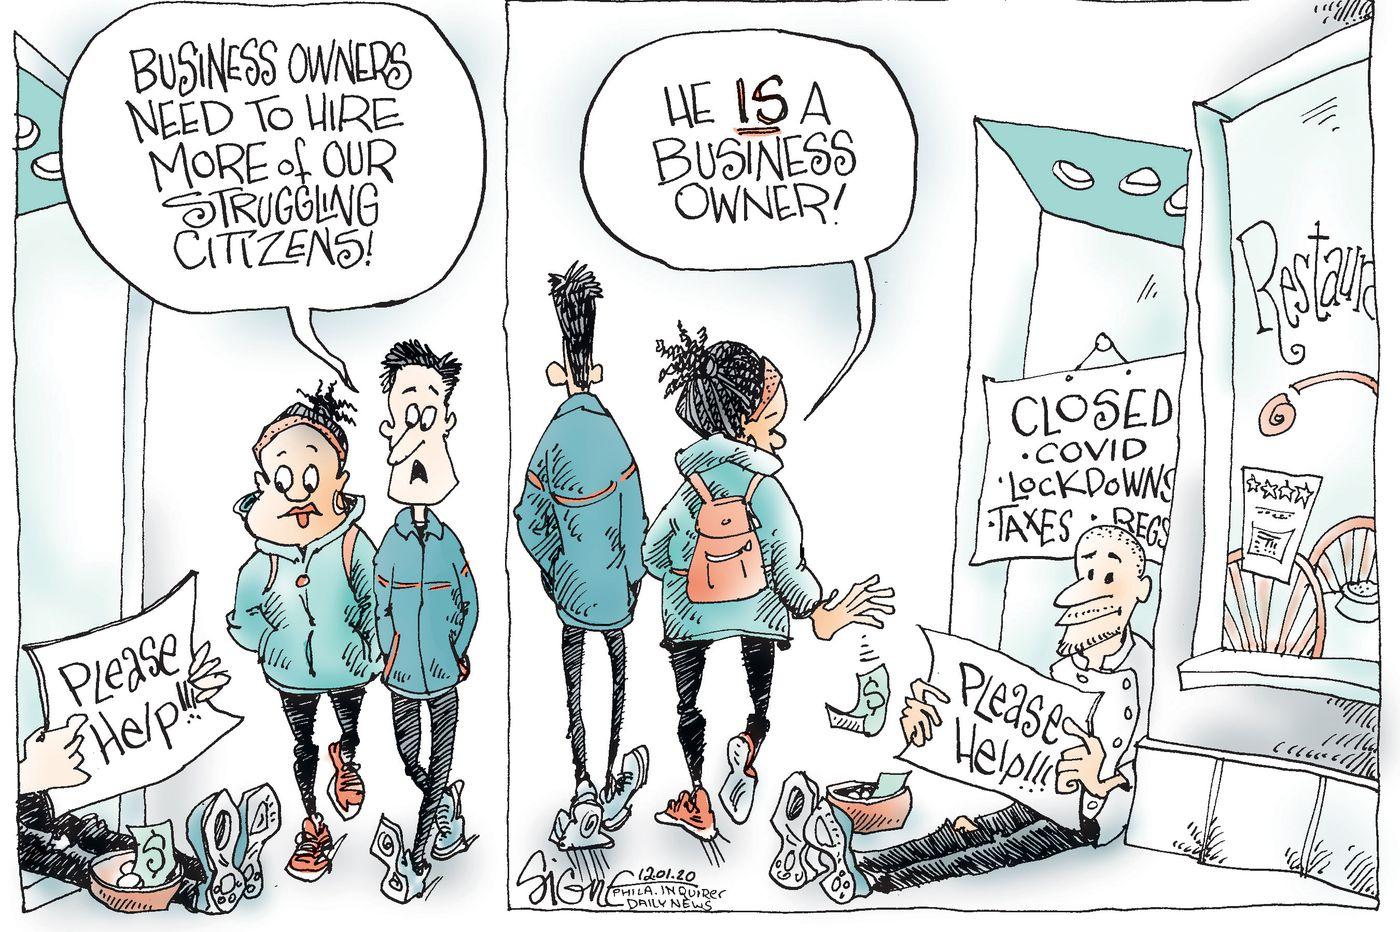 Political Cartoon: Small business sidewalk sale